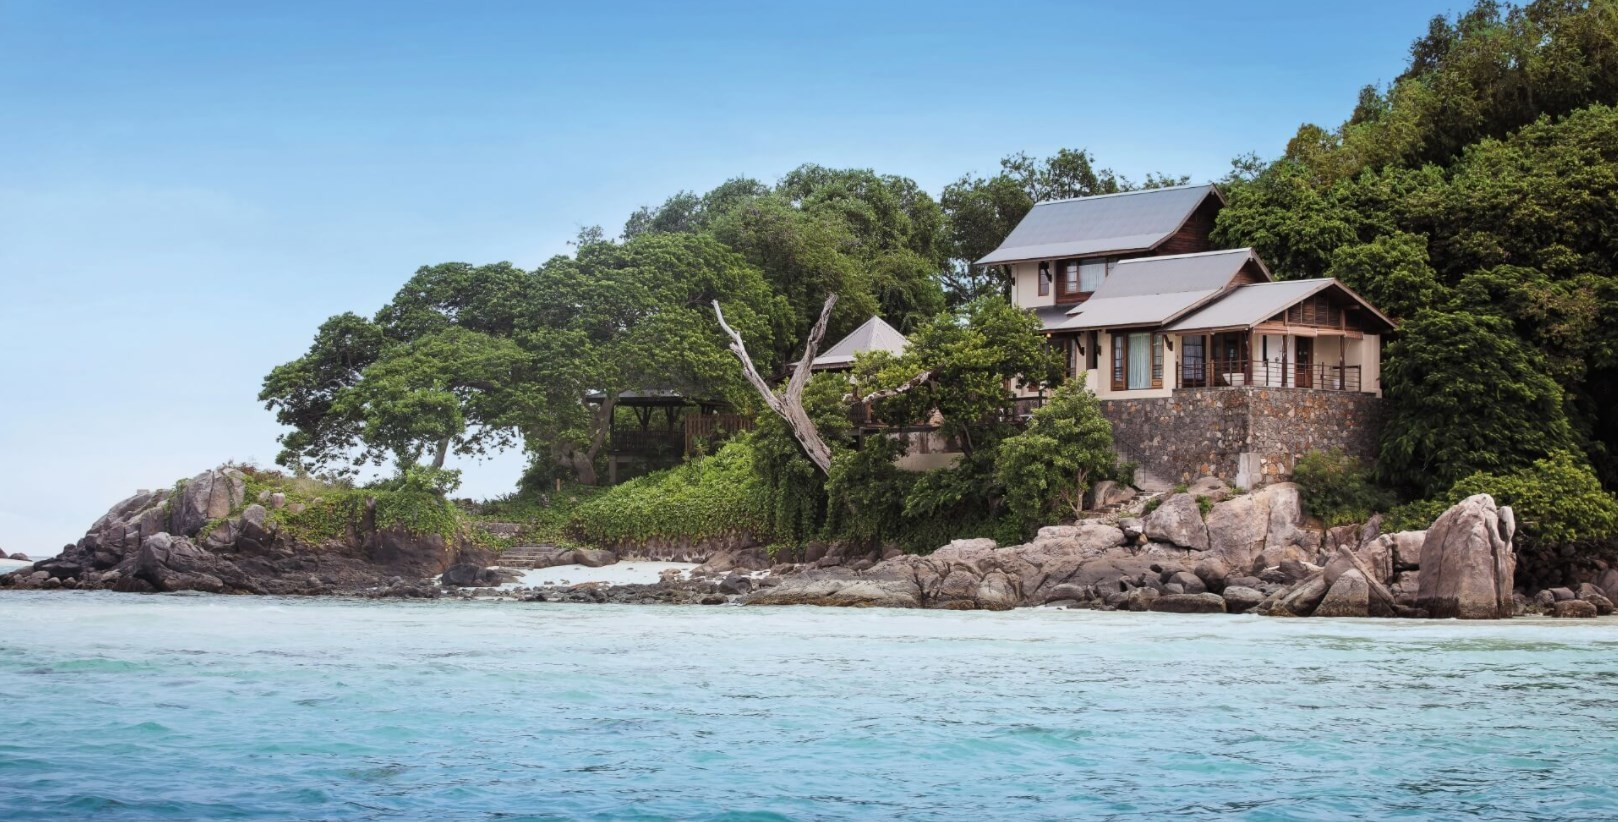 news-main-noew-opening-ja-enchanted-waterfront-villas-seychelles.1616780018.jpg